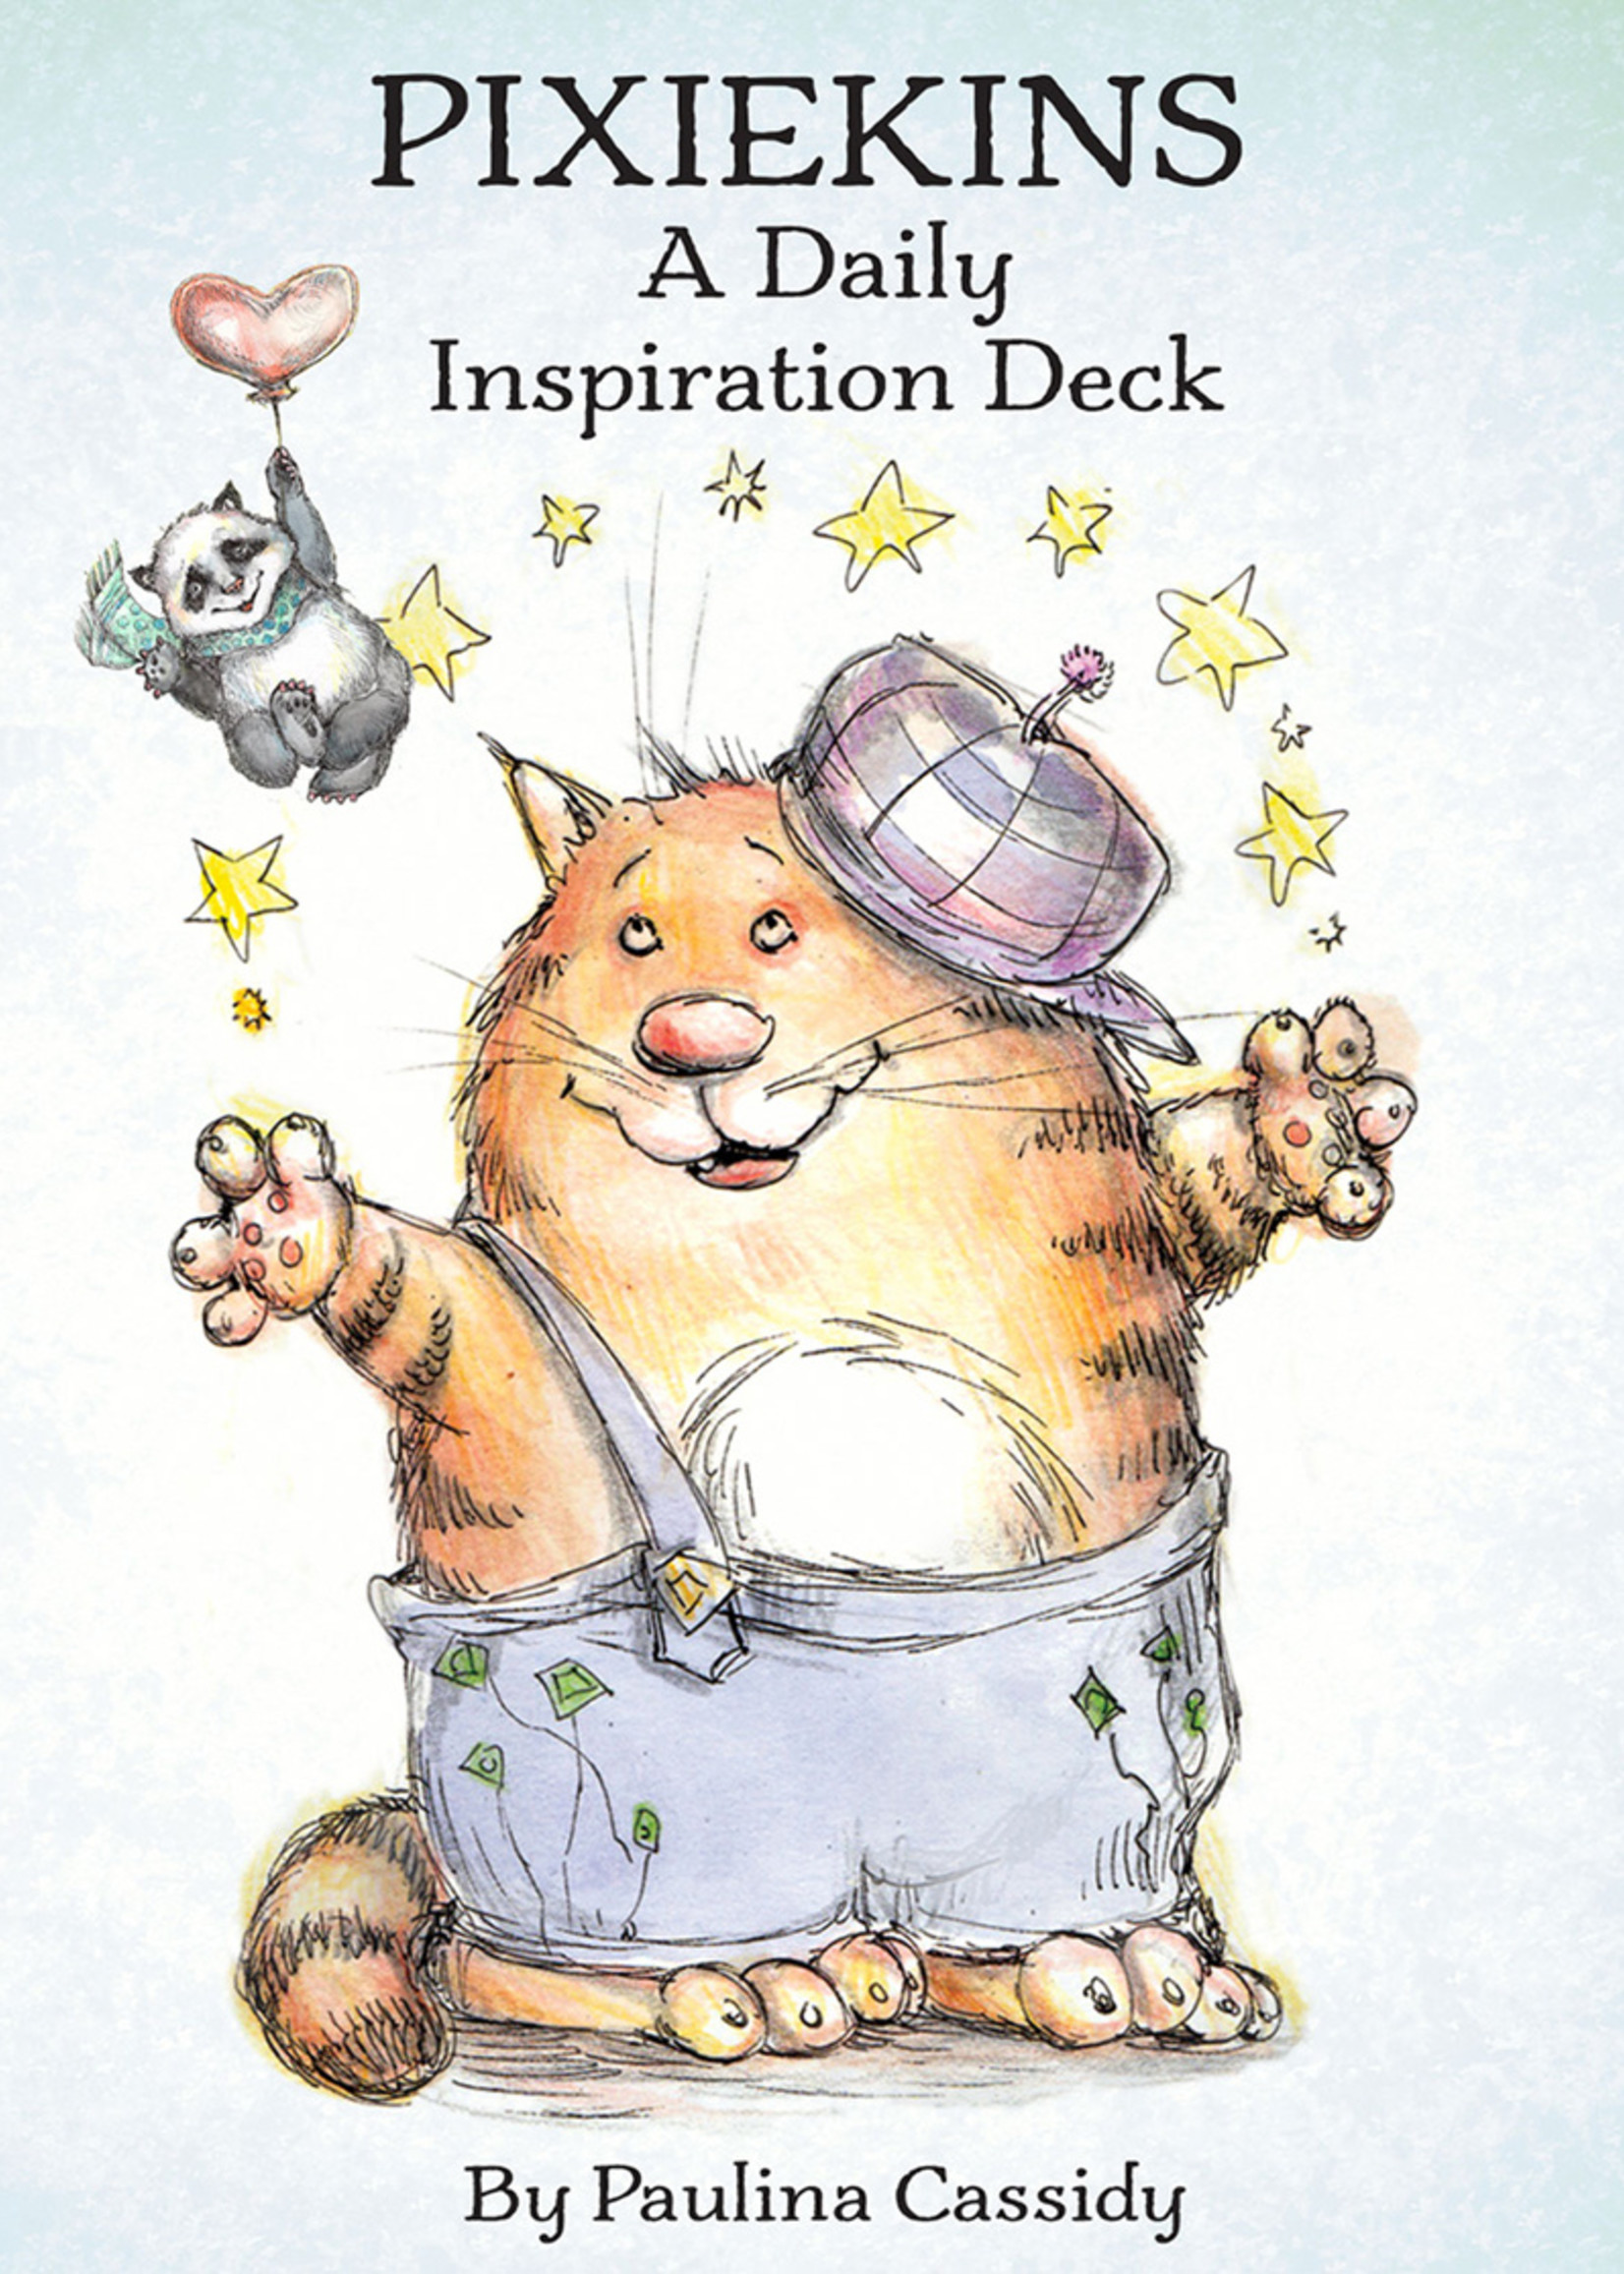 Pixiekins: A Daily Inspiration Deck - Box